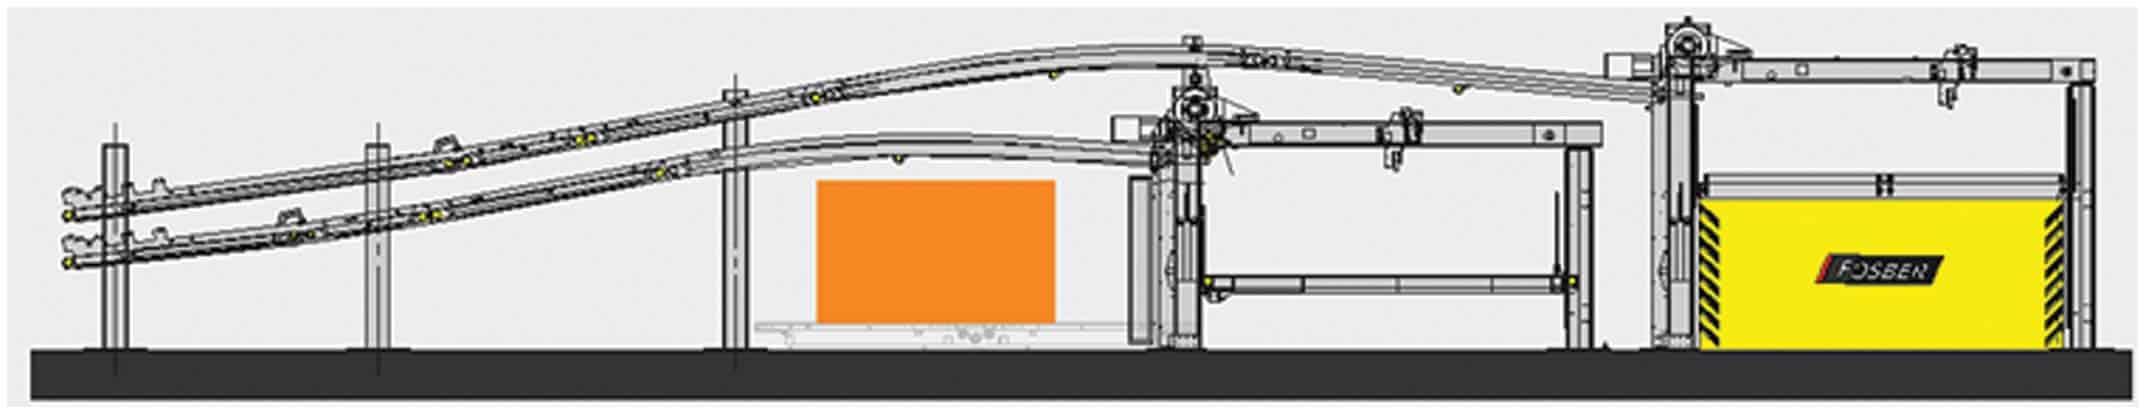 Compact Terminal TR5 DownStacker